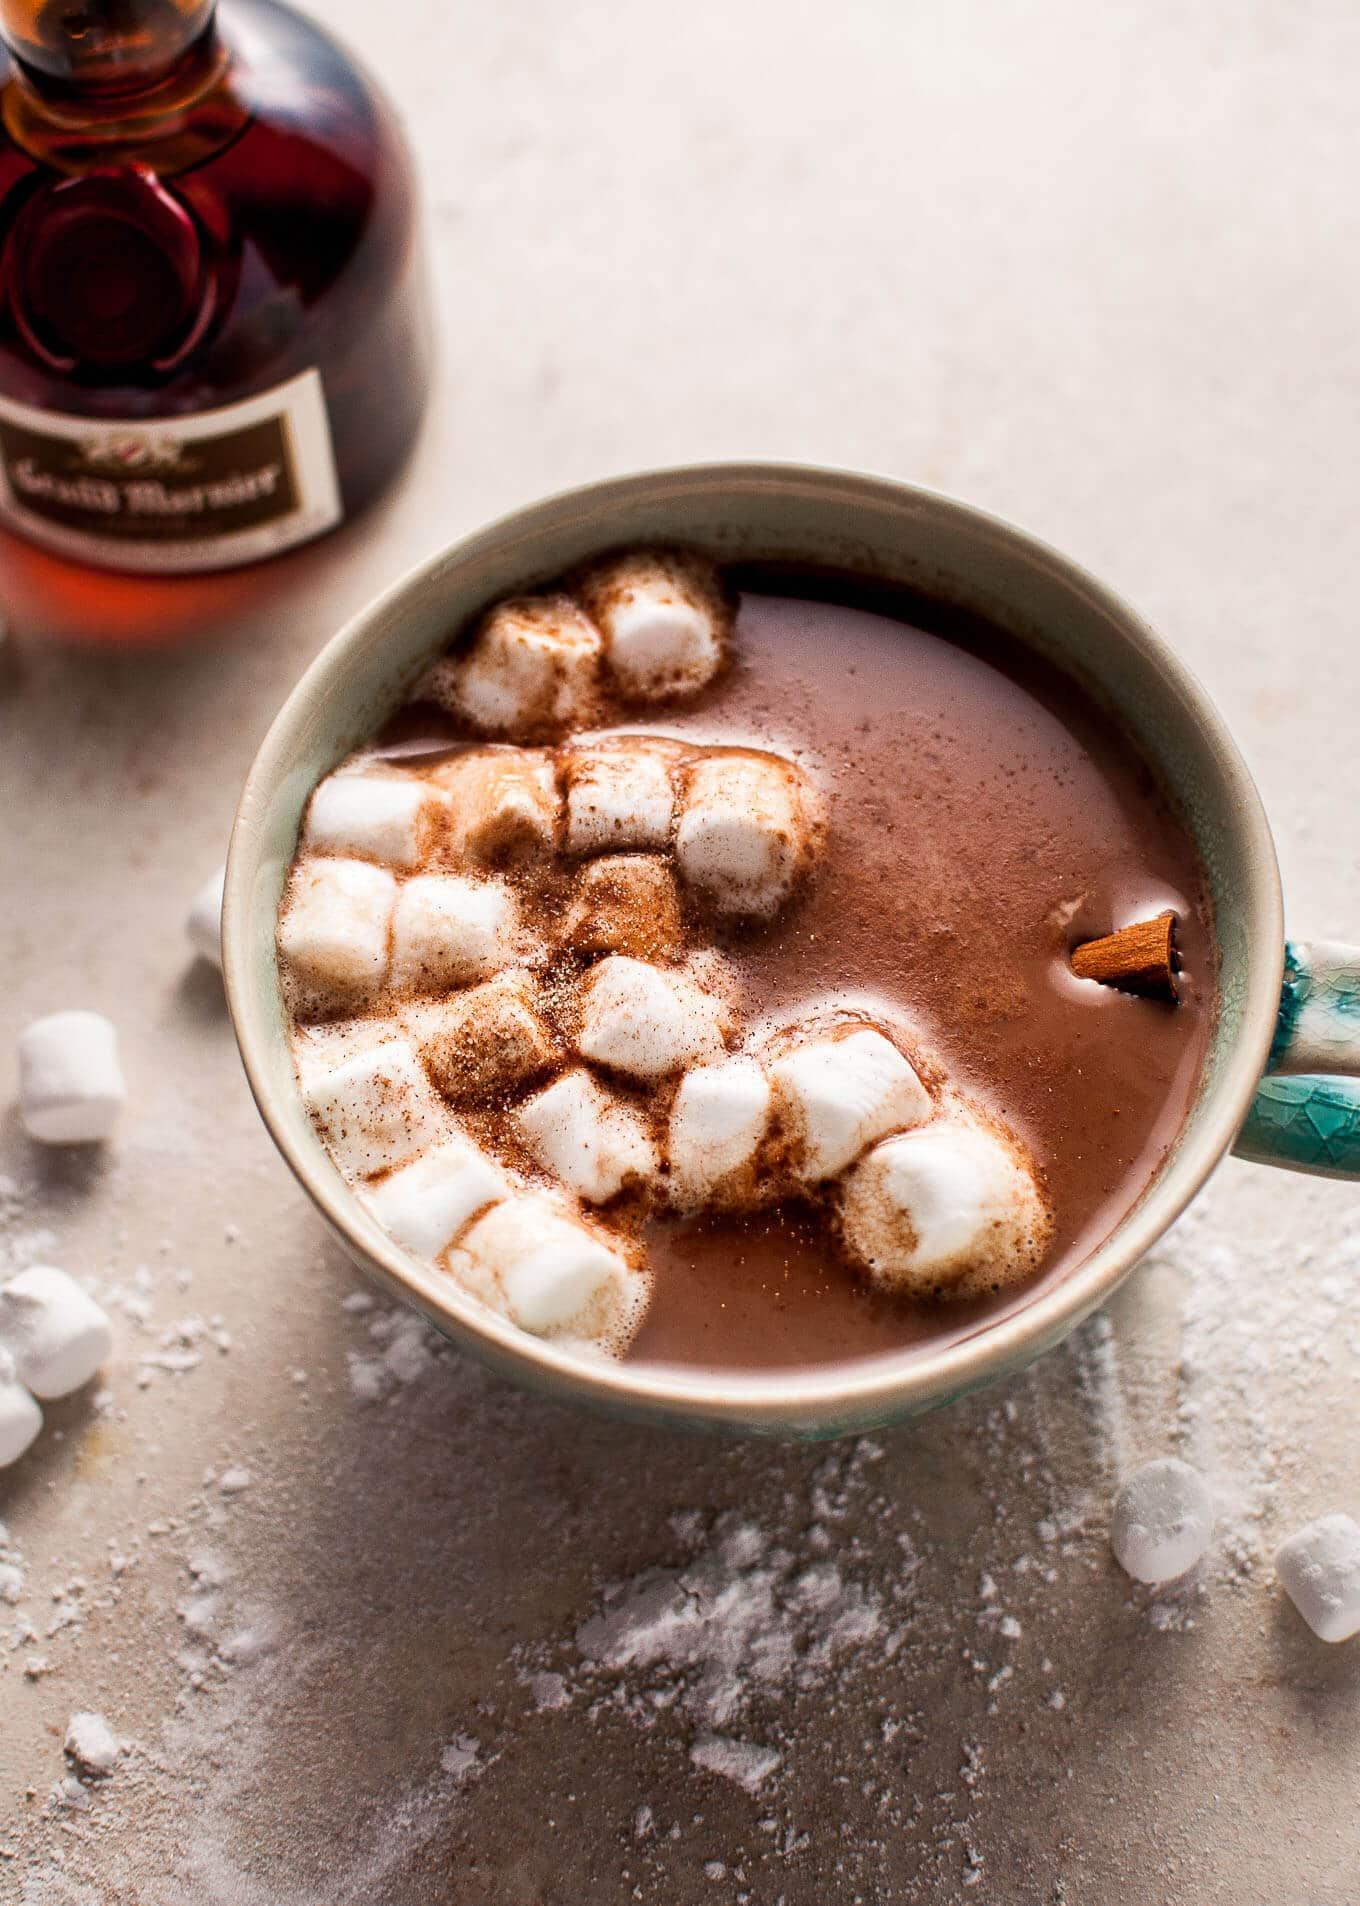 Orange Spiked Boozy Hot Chocolate • Salt & Lavender